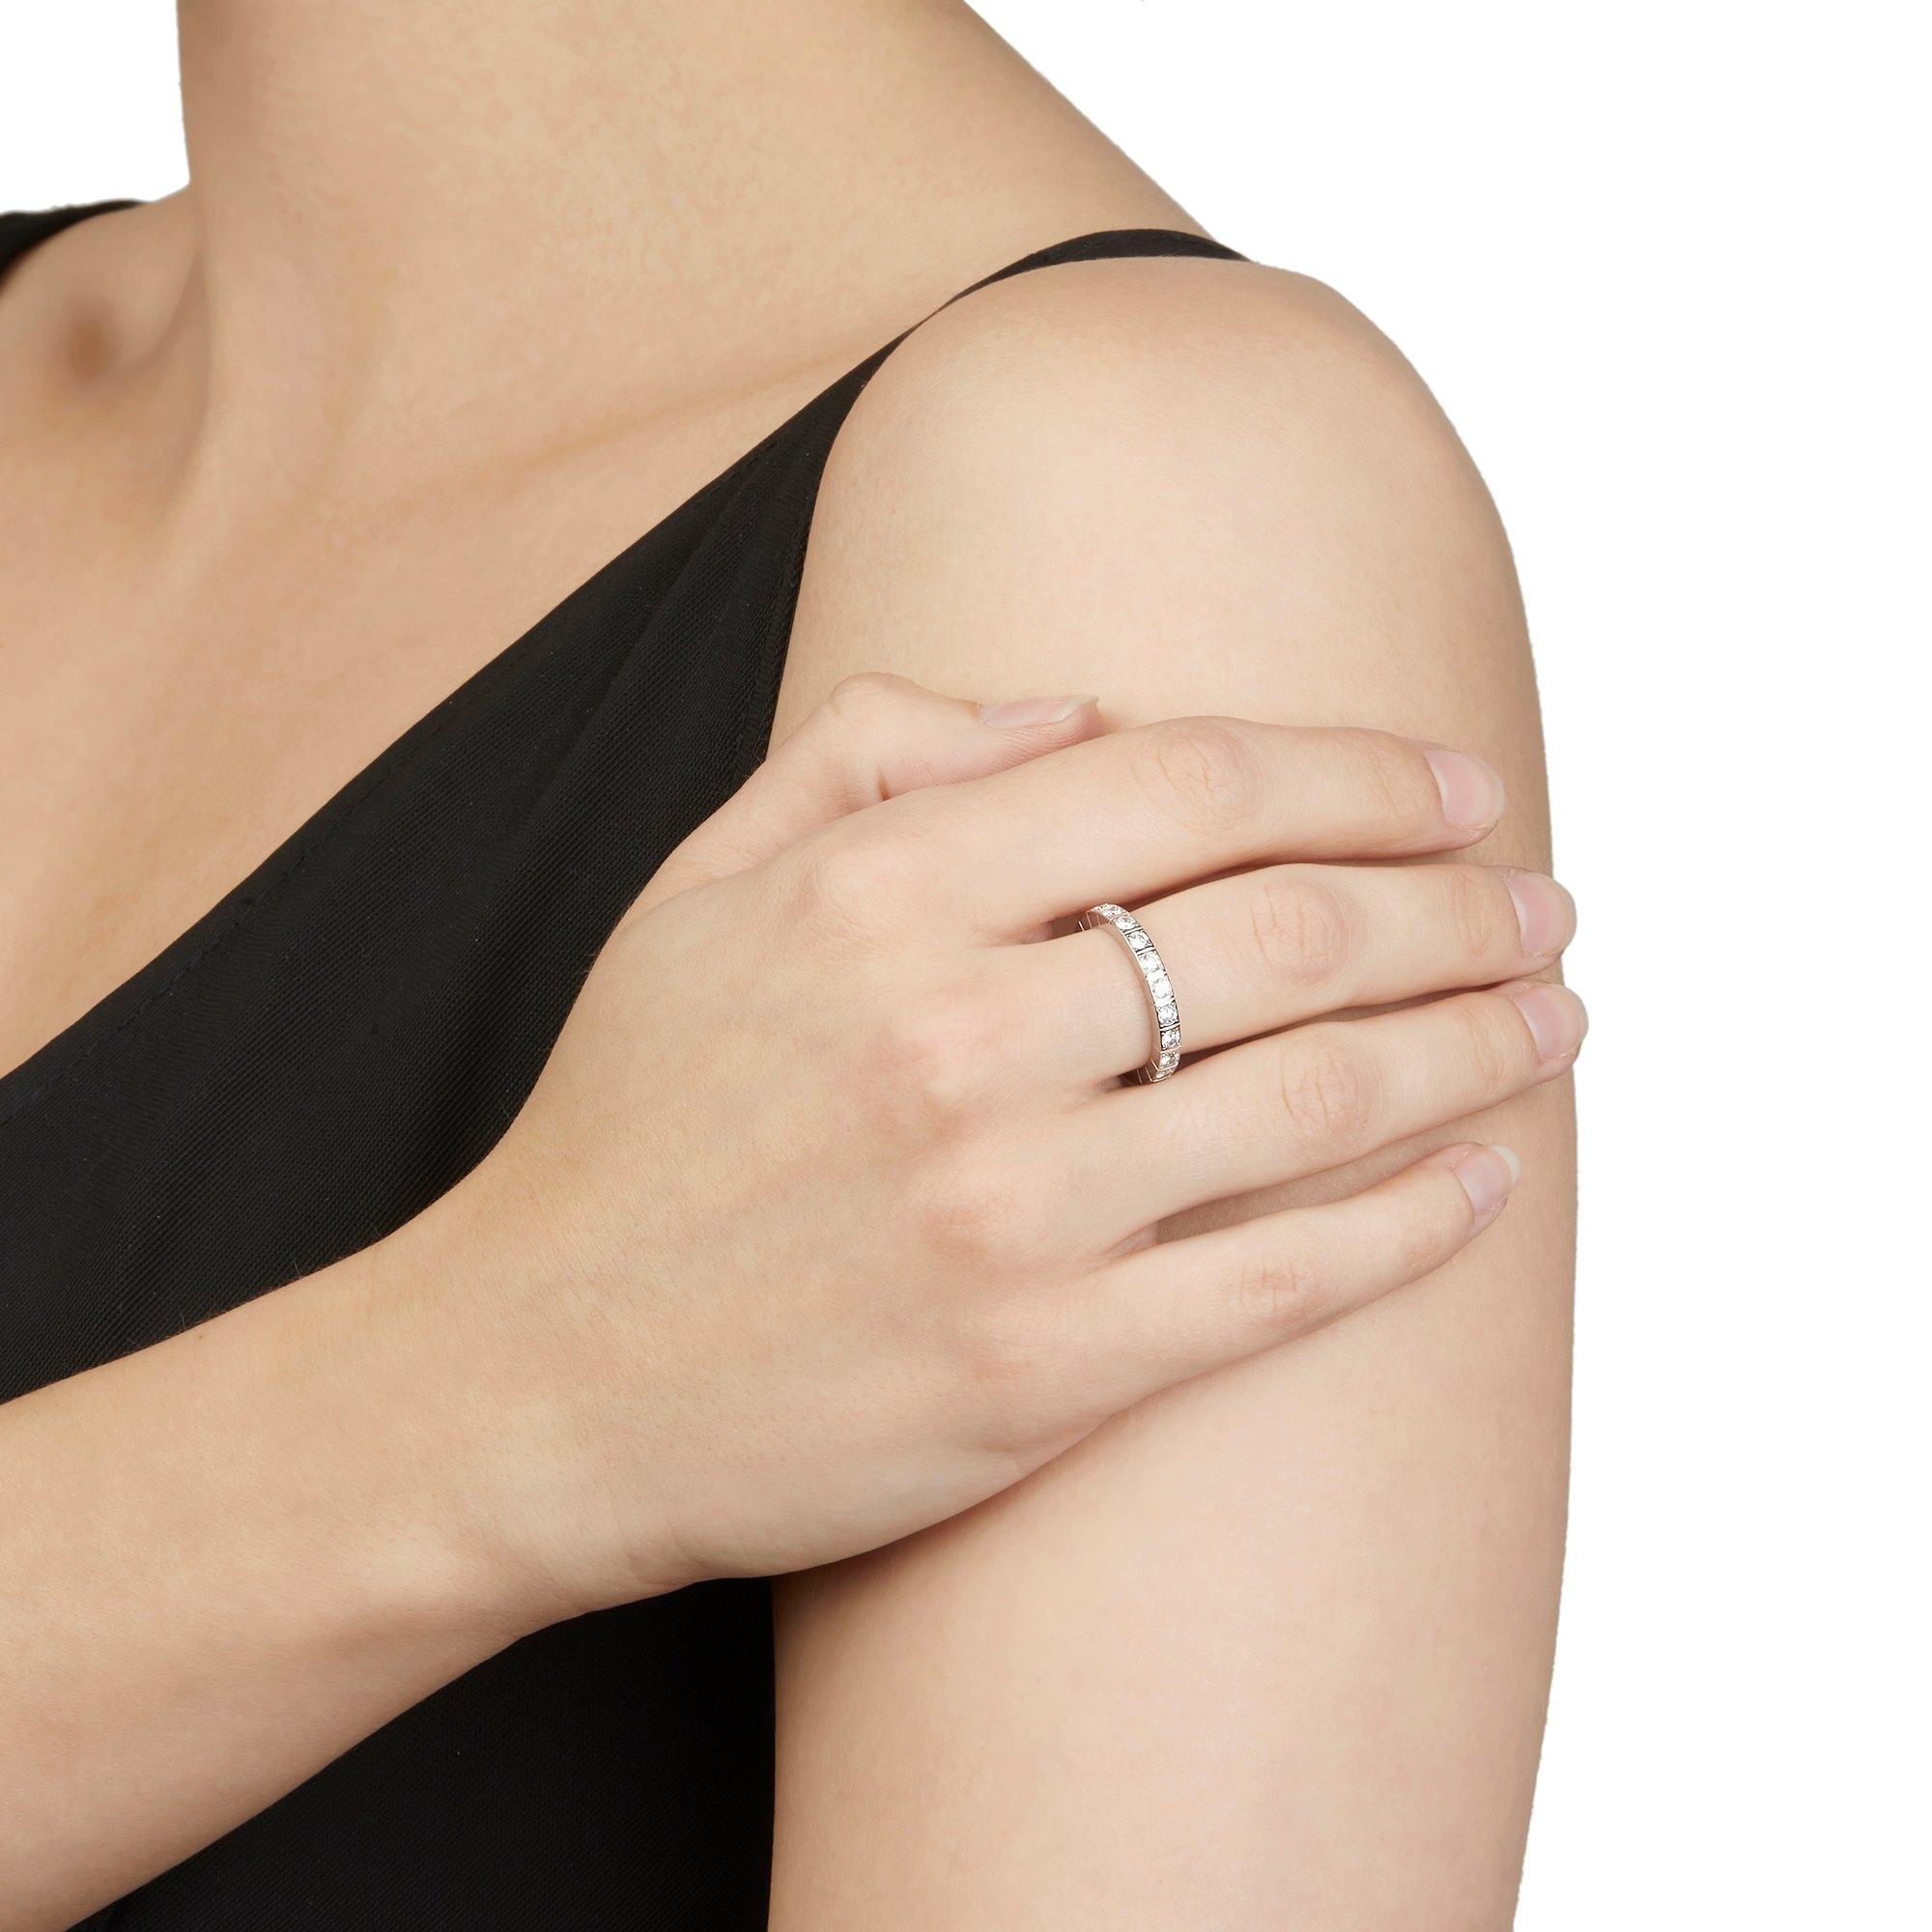 Cartier 18k White Gold Diamond Lanieres Ring